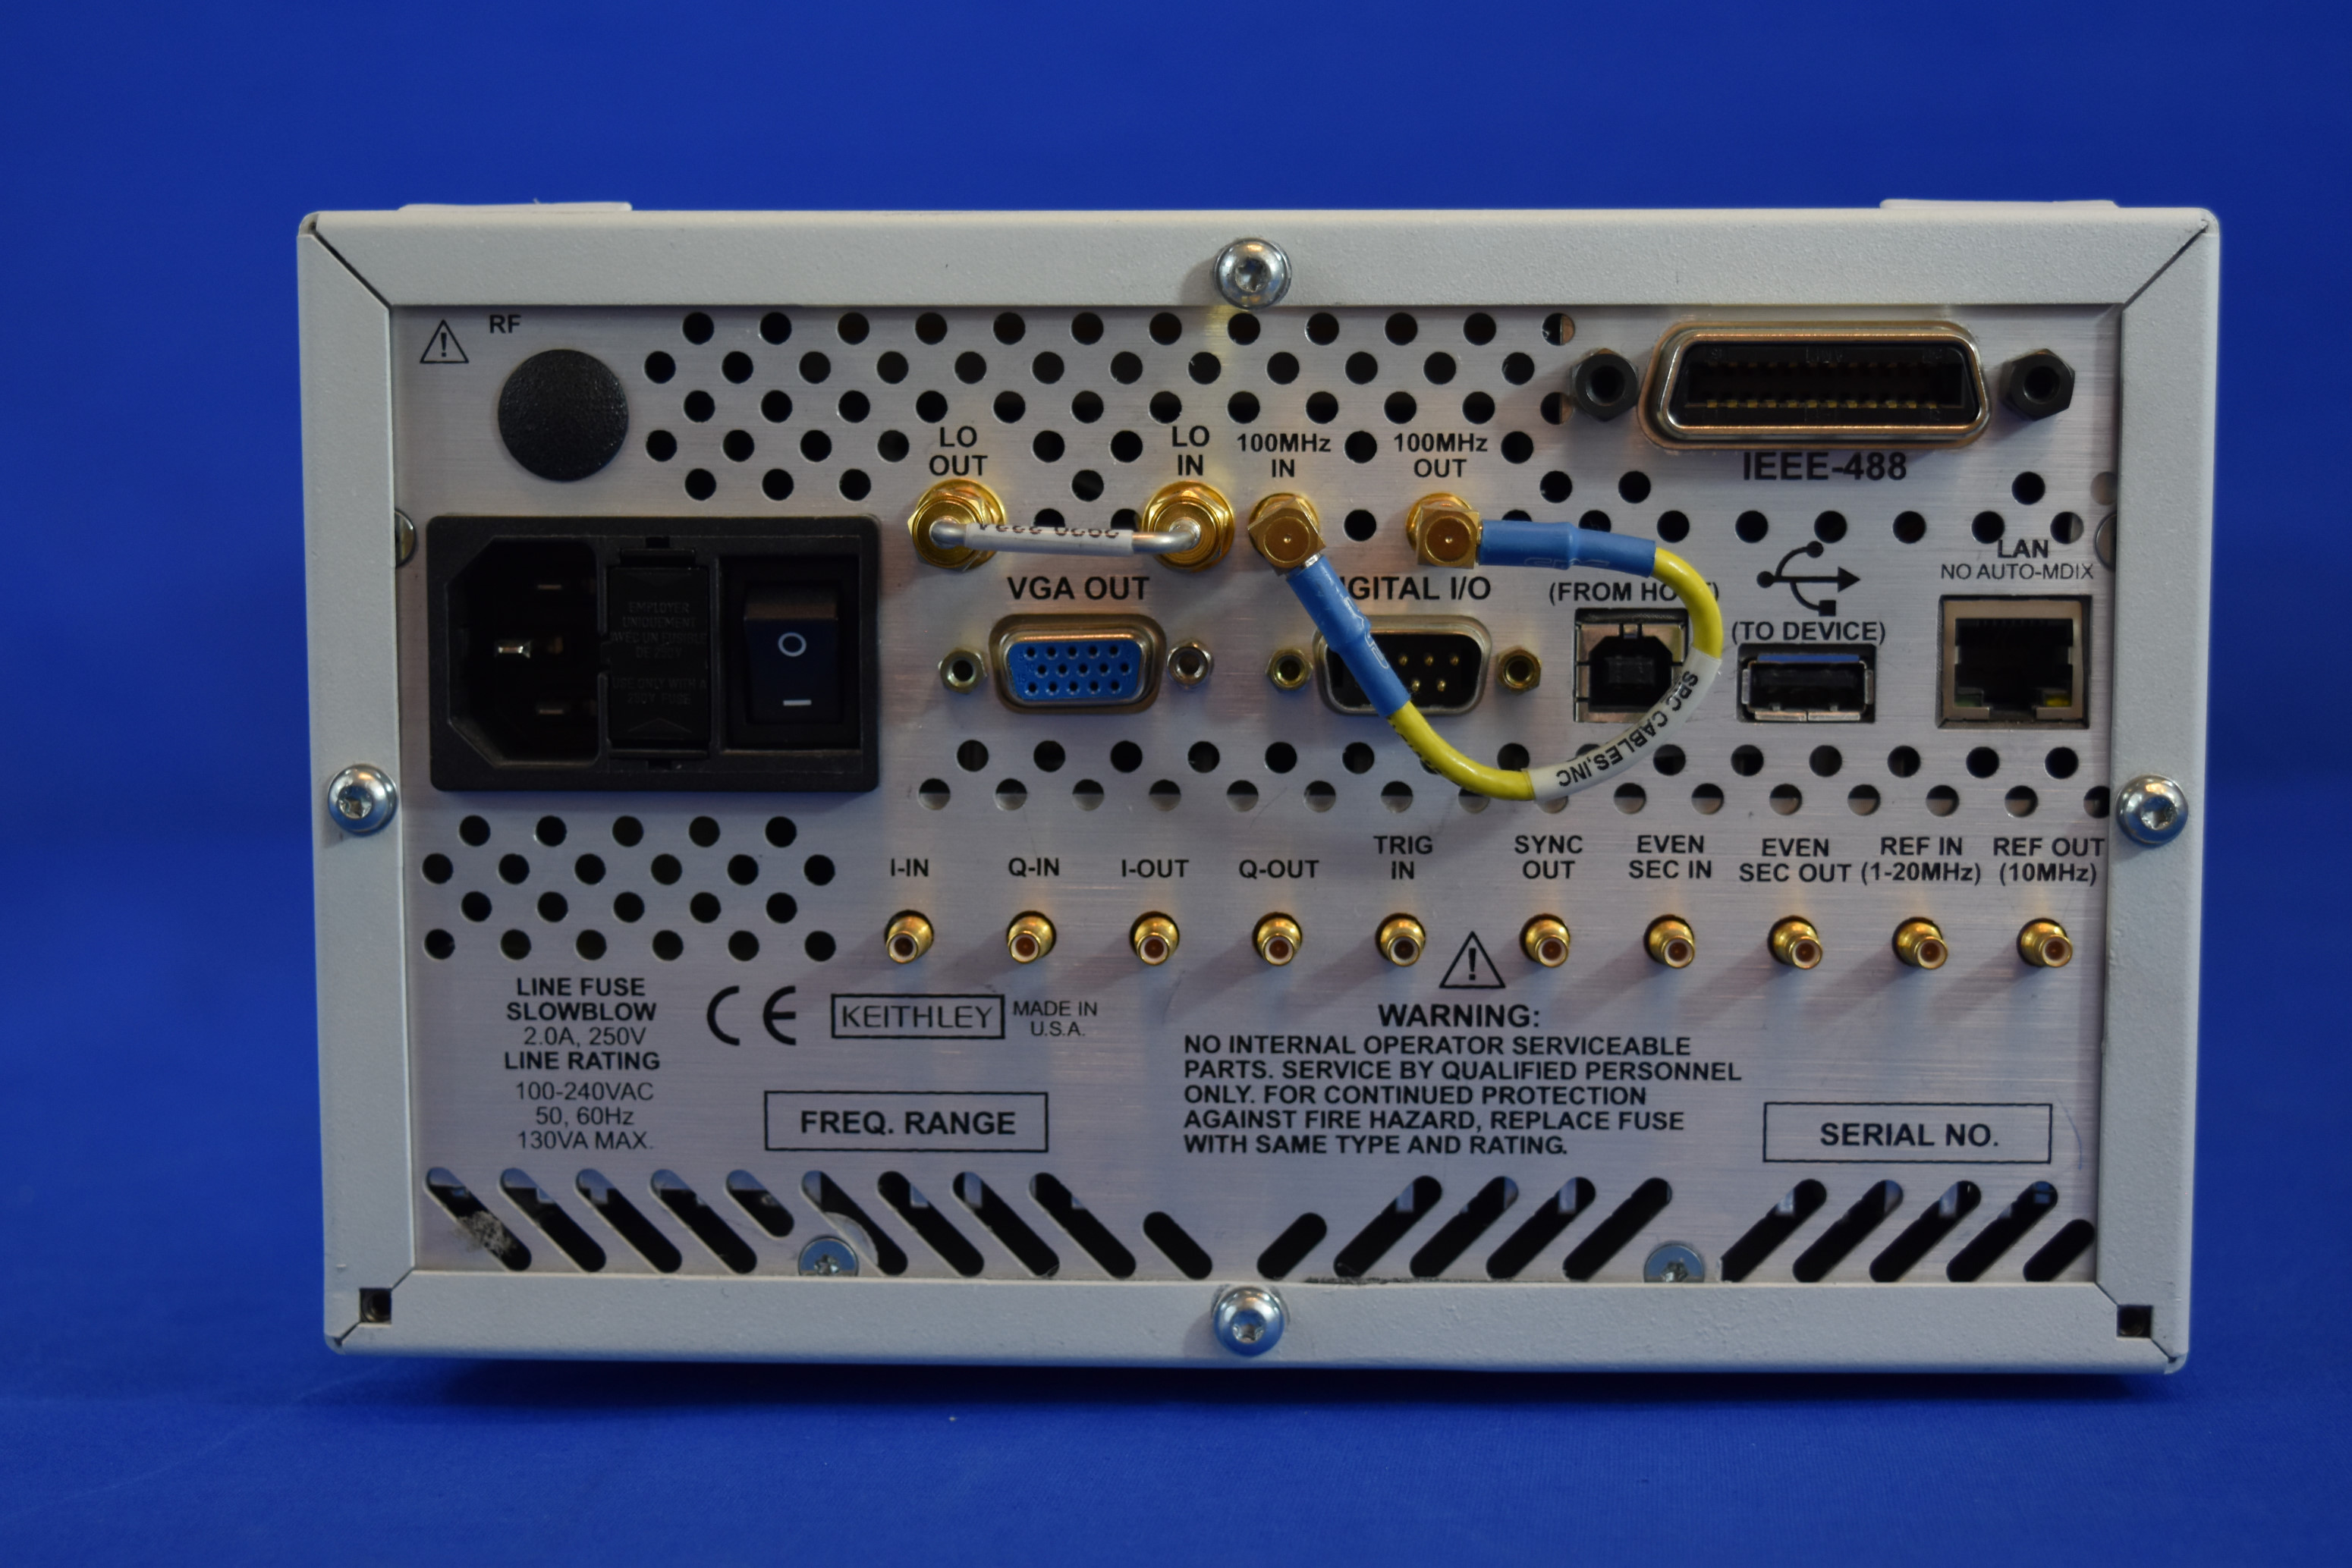 Keithley 2920a Agilent V2920a Rf Vector Signal Generator 001 60 20mhz High Speed Ghz